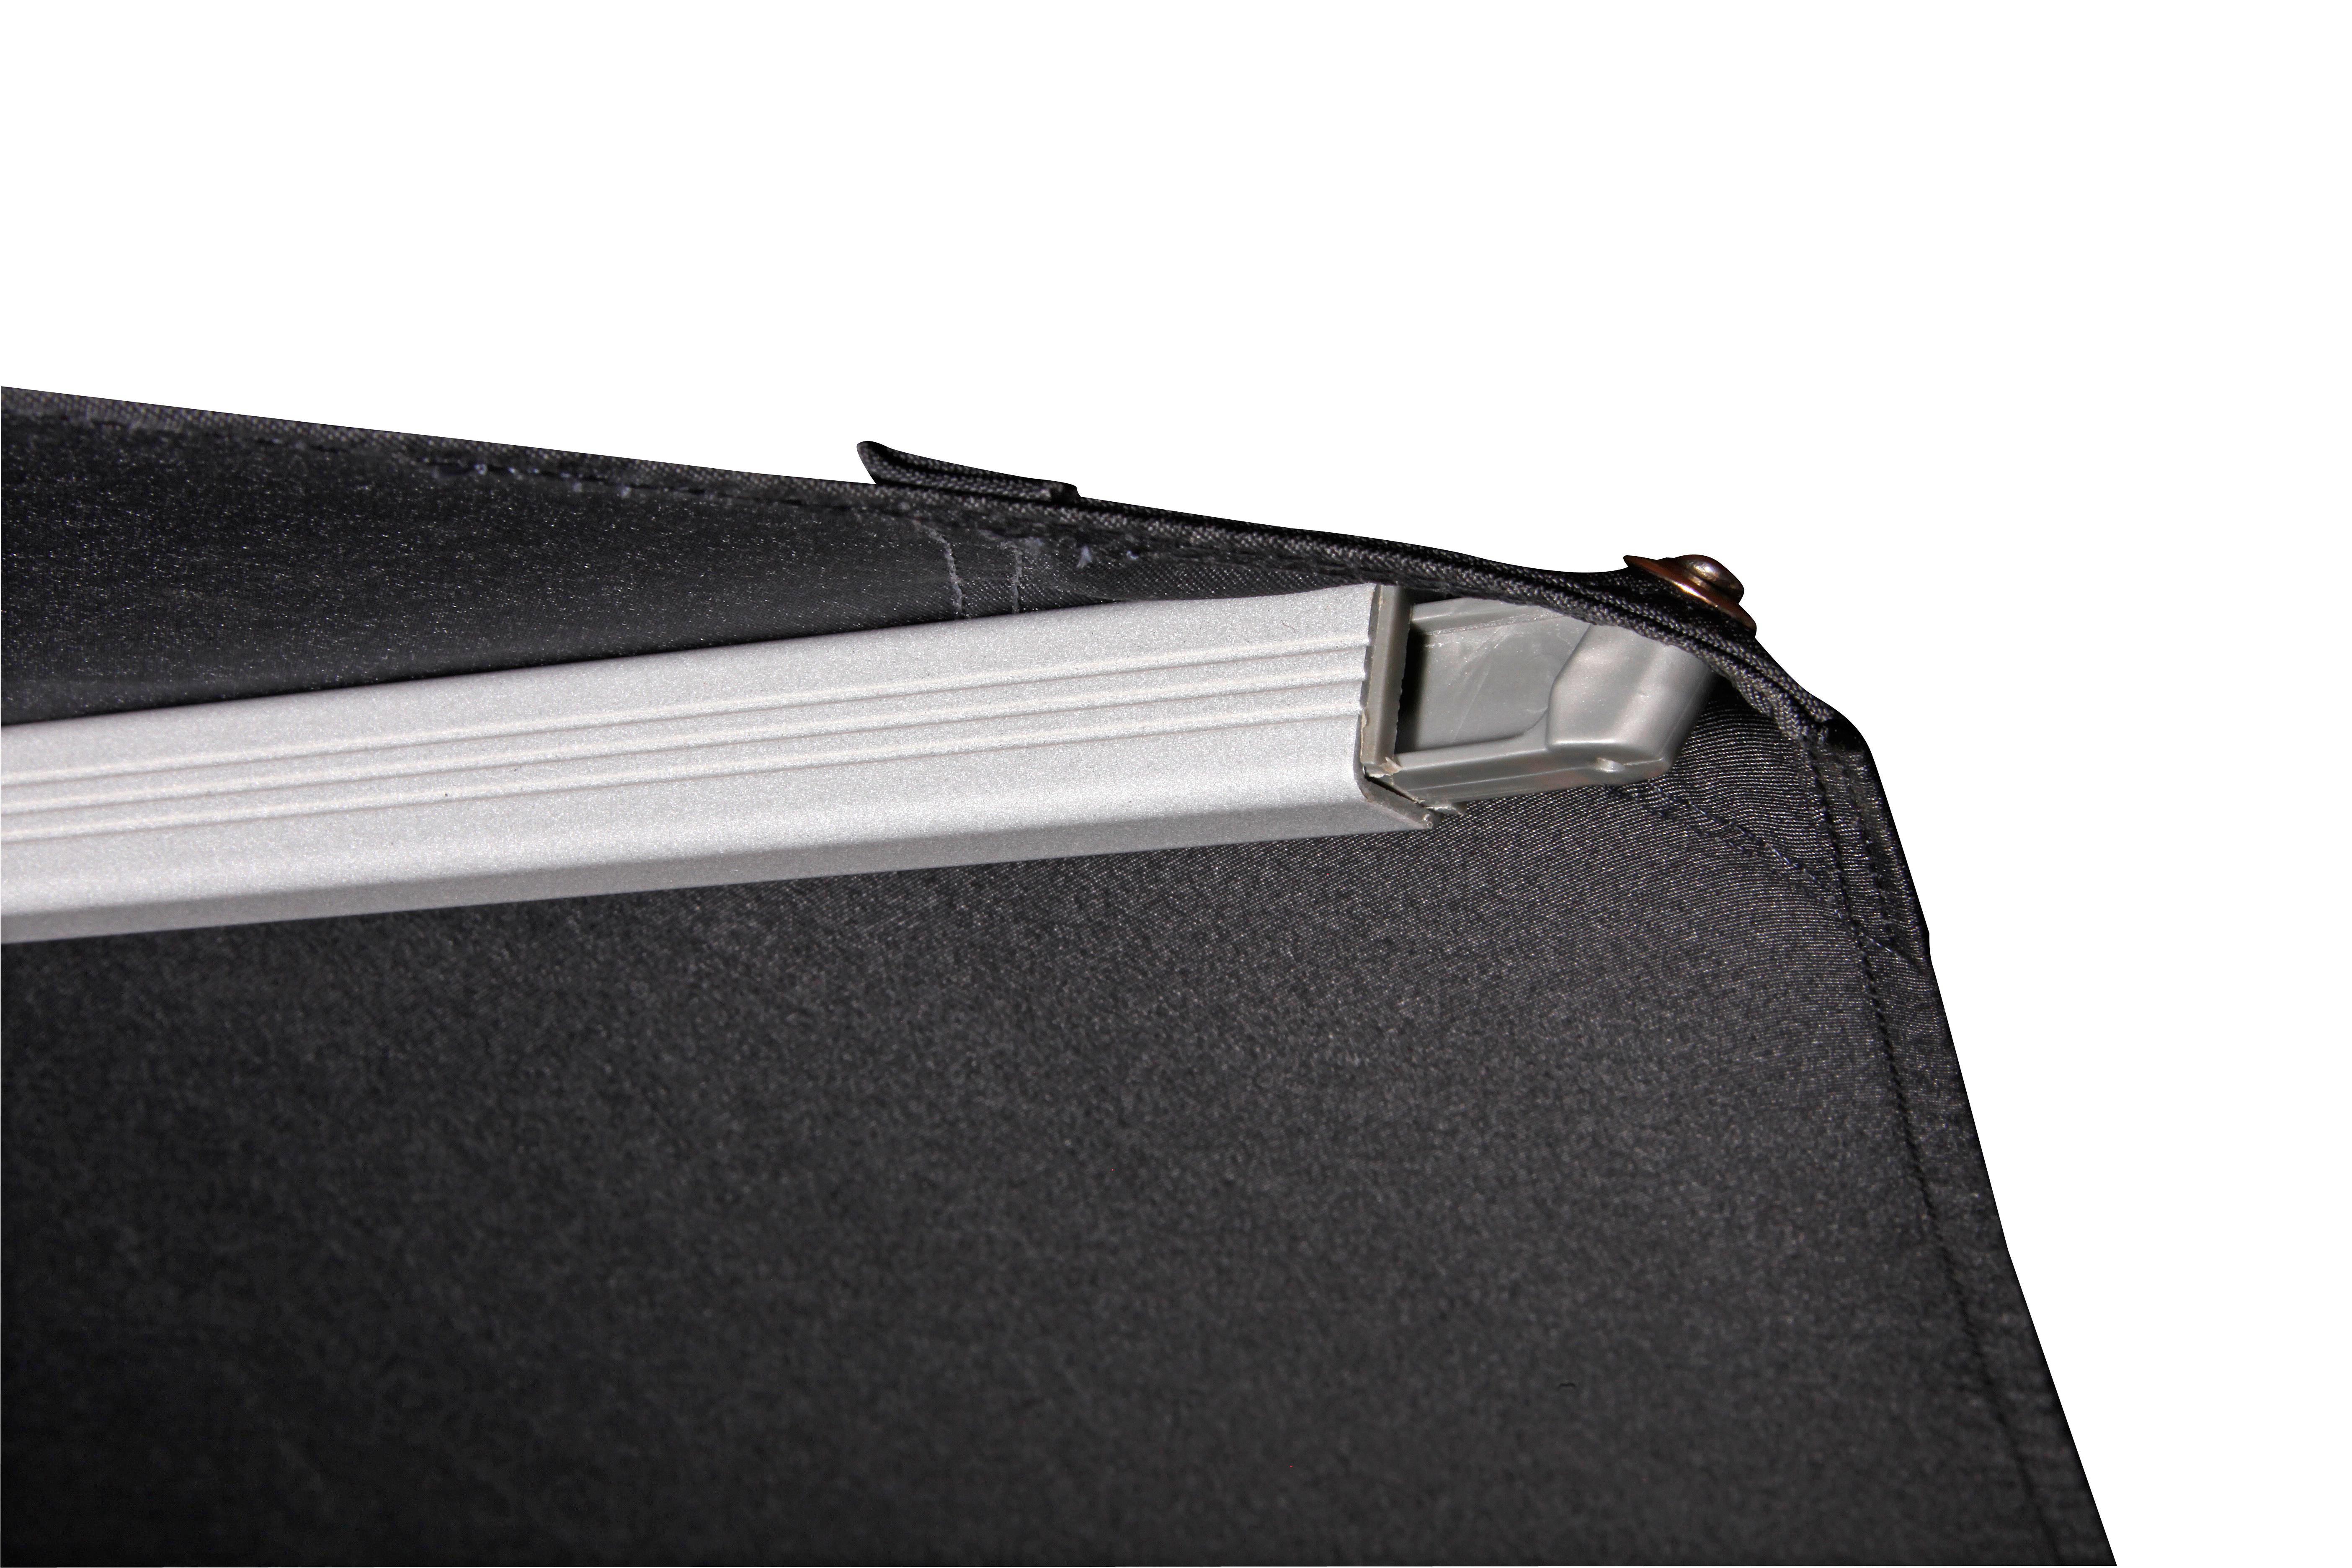 PENDELSCHIRM 275 cm Dunkelgrau - Dunkelgrau/Silberfarben, KONVENTIONELL, Textil/Metall (275/263/275cm)